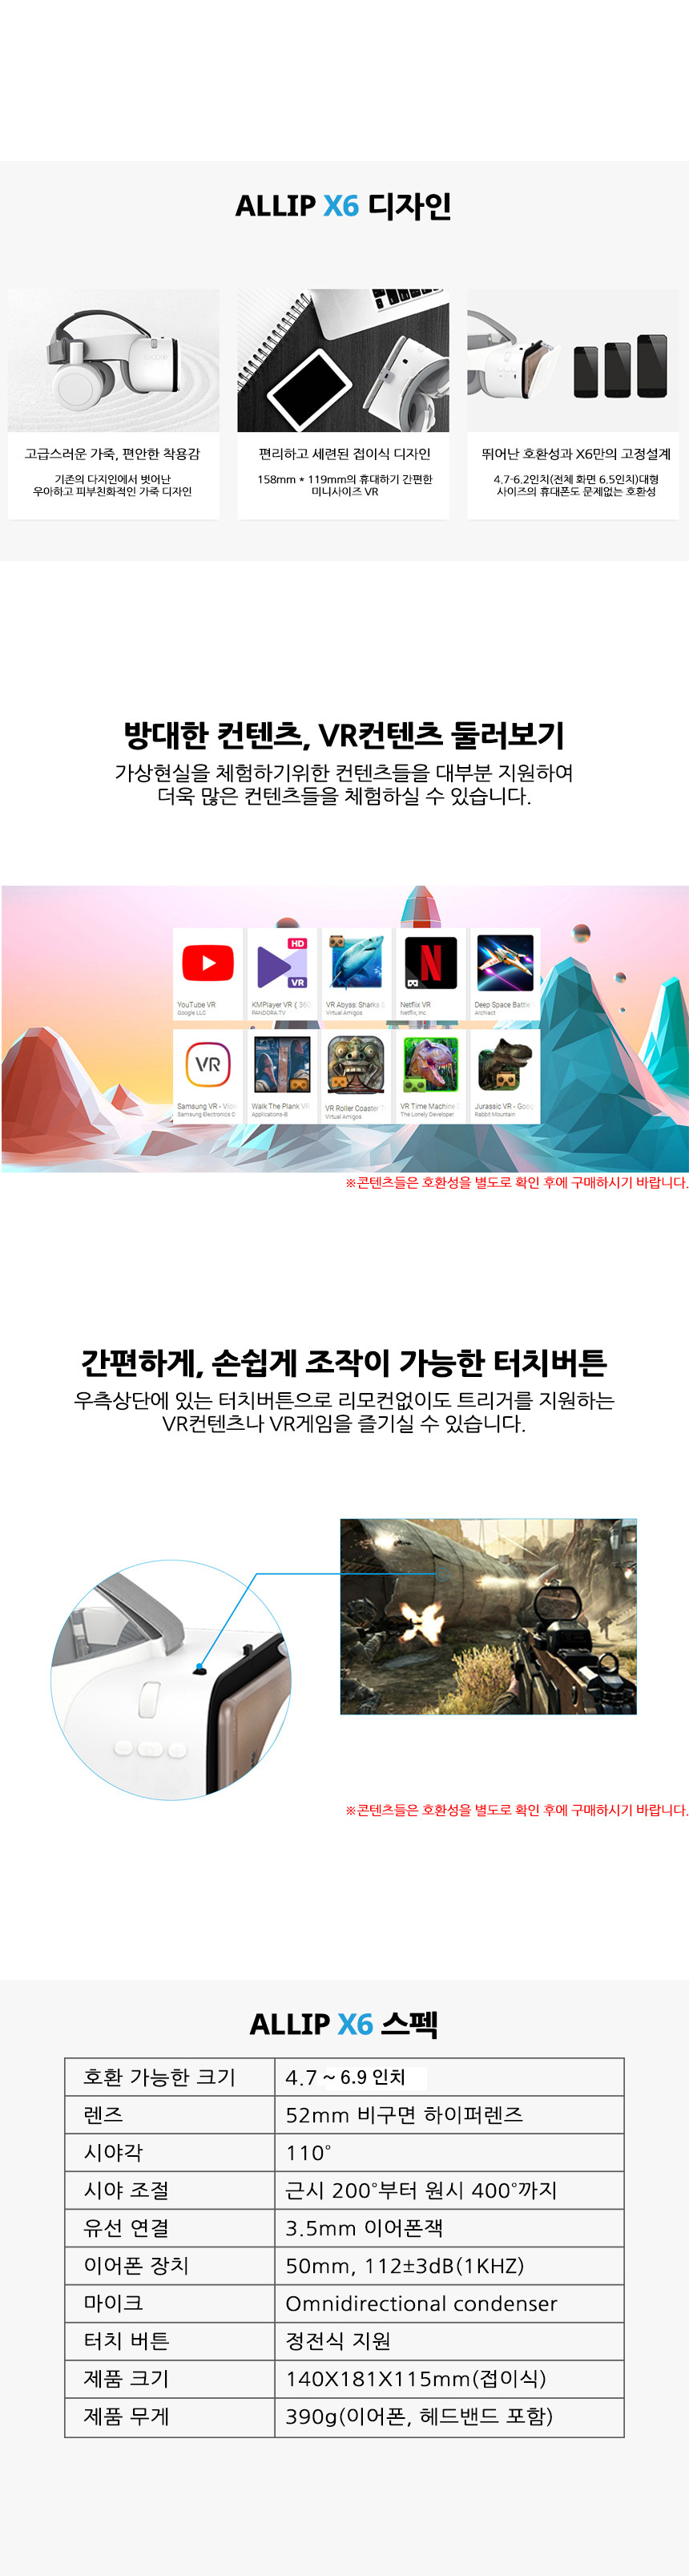 VR HMD 스마트폰용 VR기기 ALLIP X647,600원-립모션디지털, 스마트기기 주변기기, 기타 주변기기, VR/3D안경바보사랑VR HMD 스마트폰용 VR기기 ALLIP X647,600원-립모션디지털, 스마트기기 주변기기, 기타 주변기기, VR/3D안경바보사랑